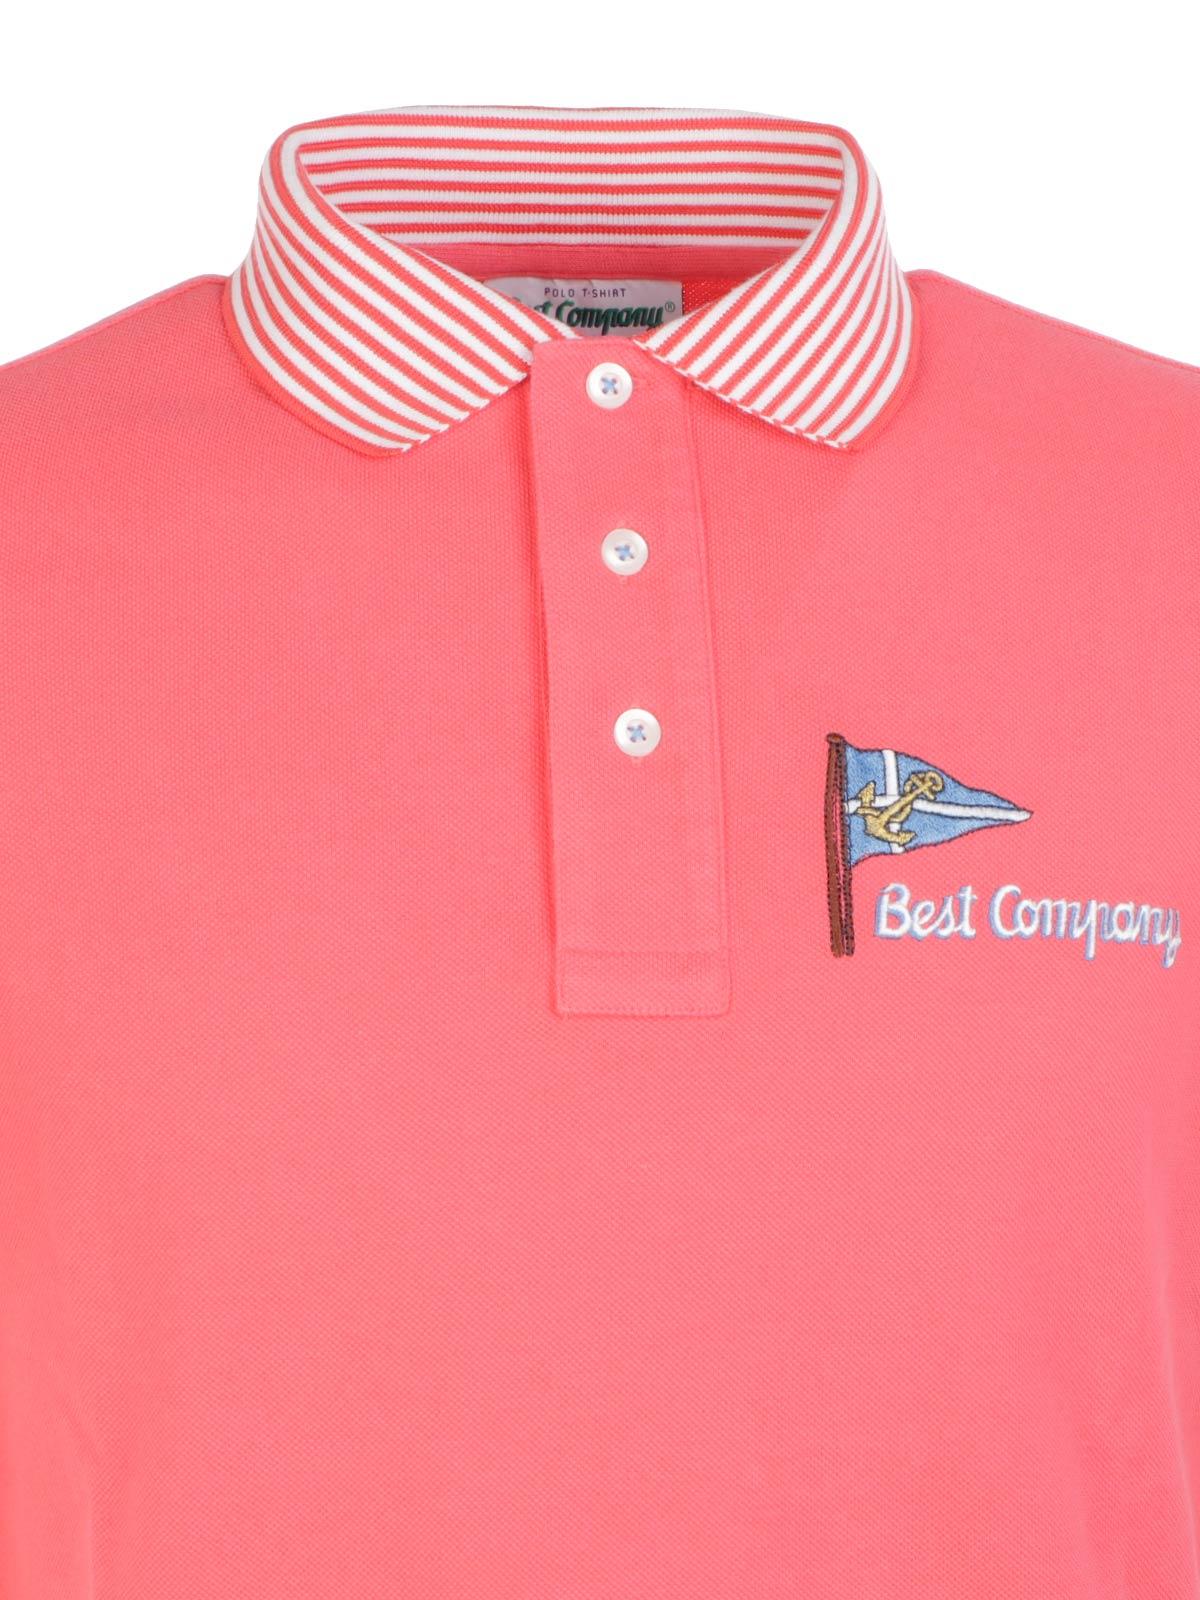 Best Company Men S Boat Polo Shirt 0718 692045 Botta B Online